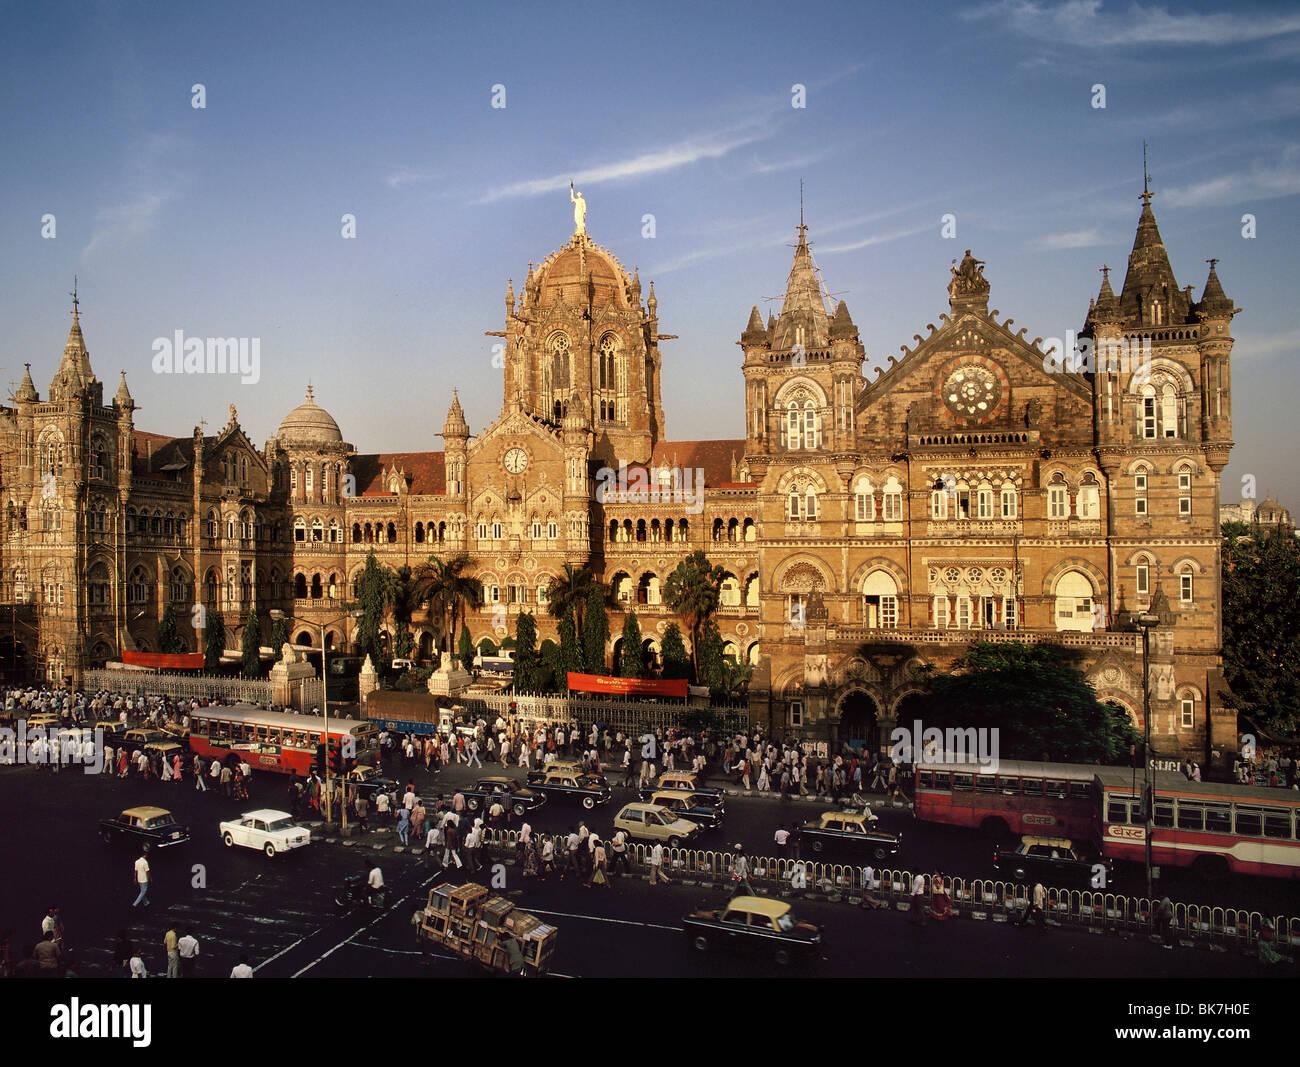 Victoria Terminus (Chhatrapati Shivaji), UNESCO World Heritage Site, Mumbai (Bombay), India, Asia - Stock Image